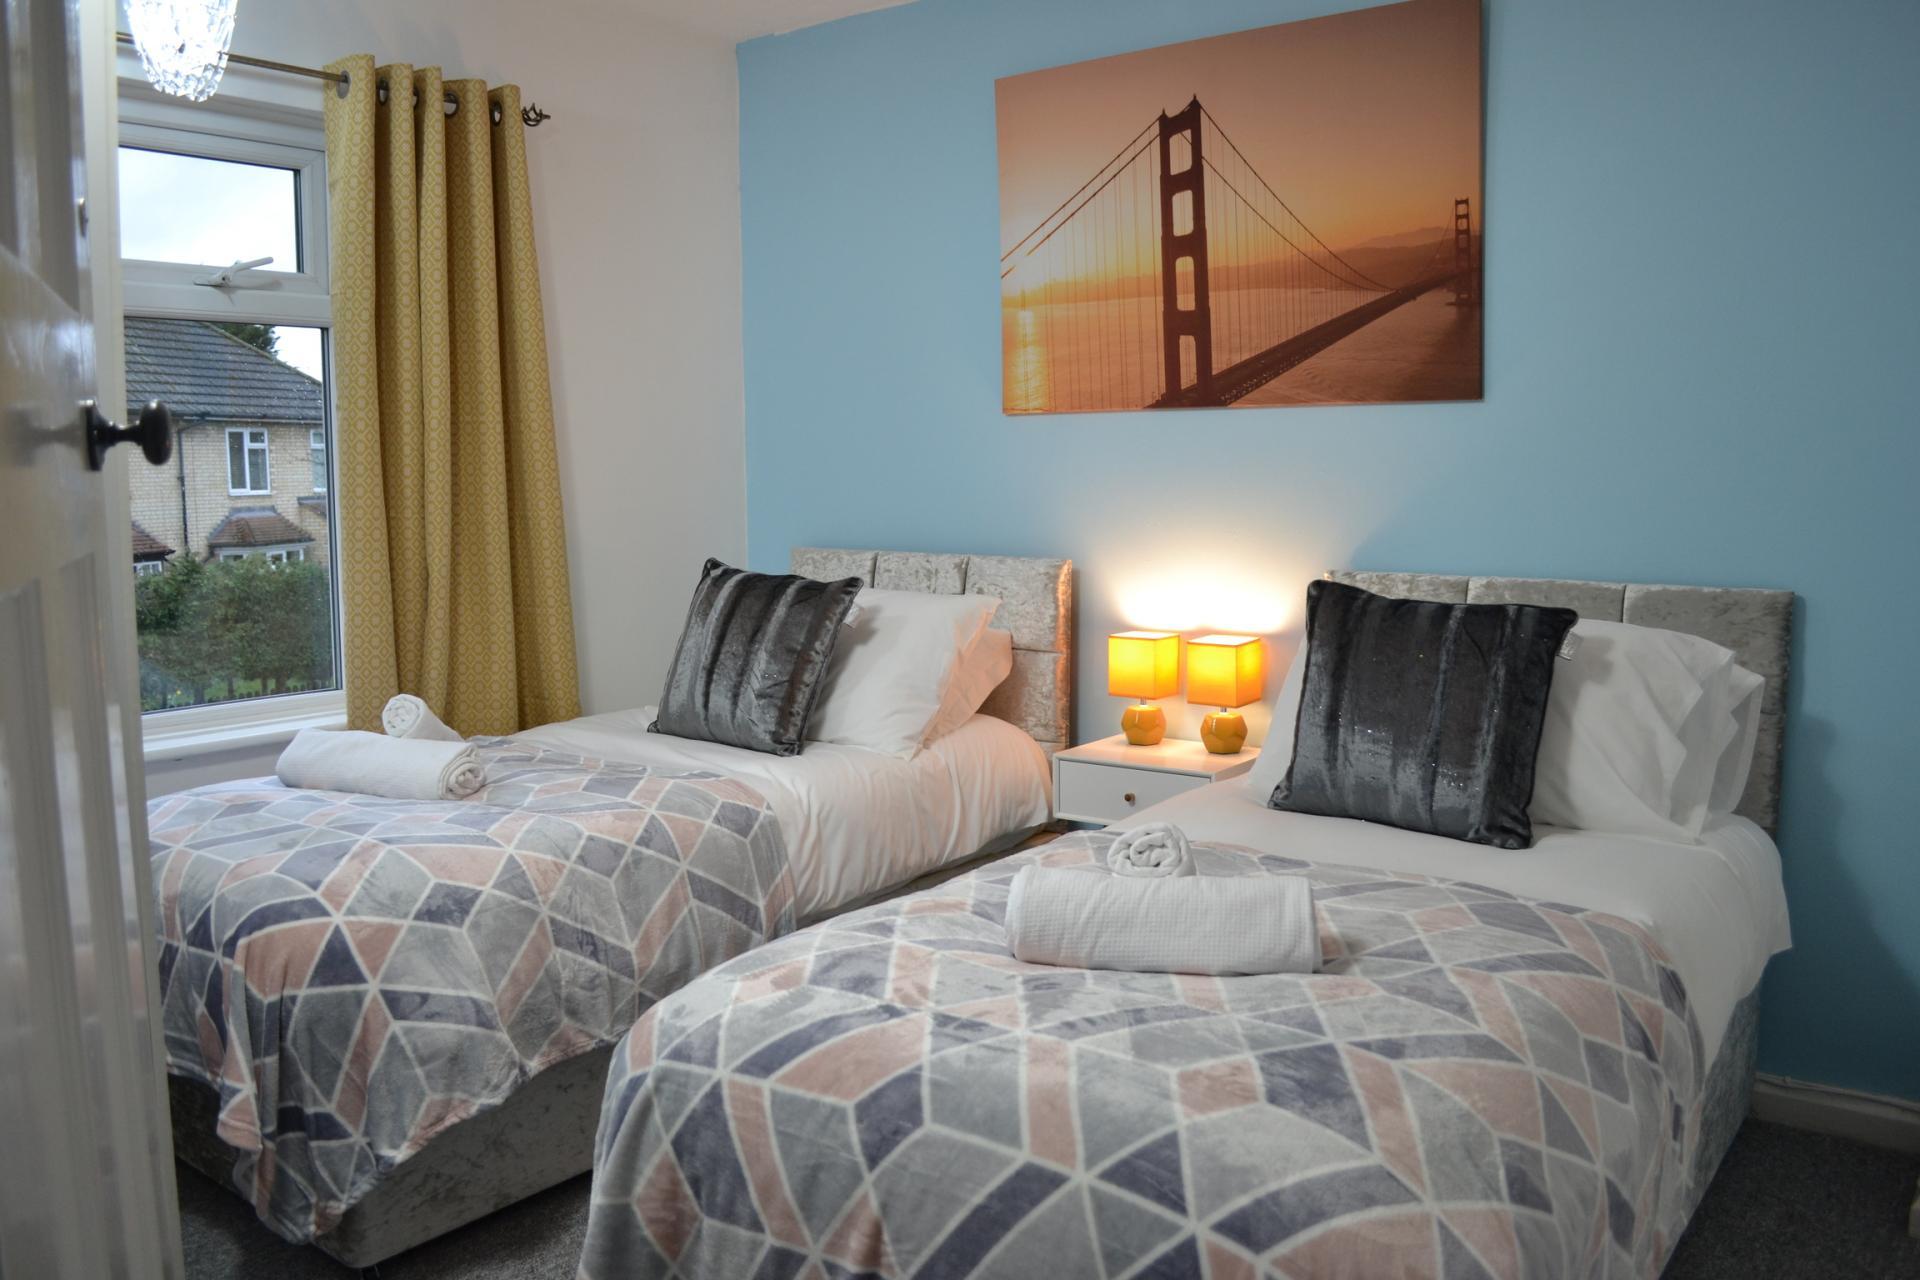 Beds at Kendal Way Home, Chesterton, Cambridge - Citybase Apartments